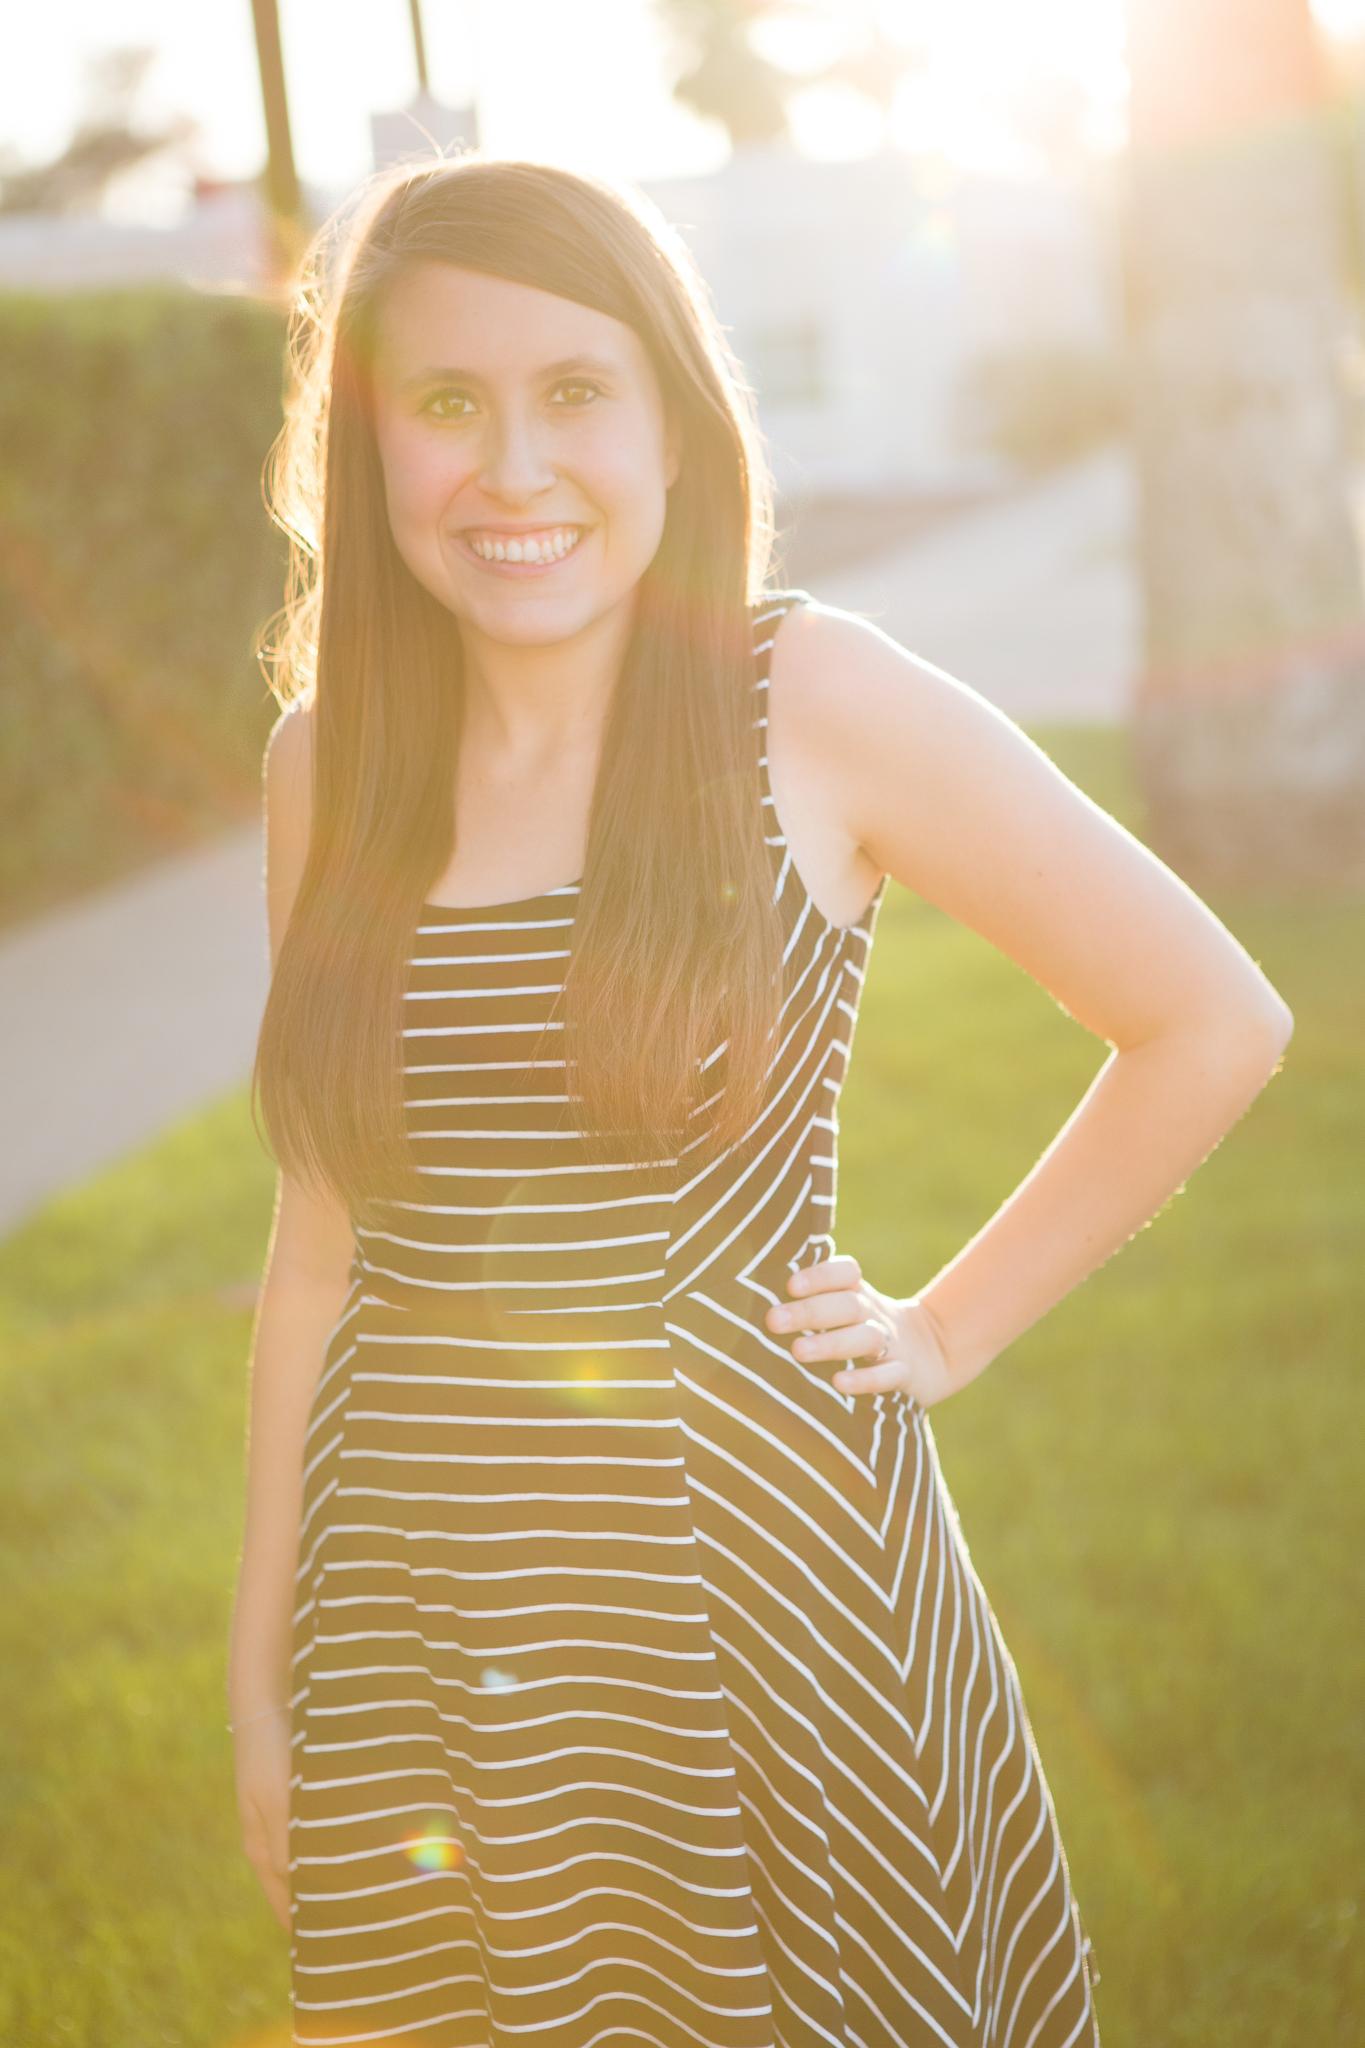 senior-photography-downtown-phoenix-lens-flare-bw-dress